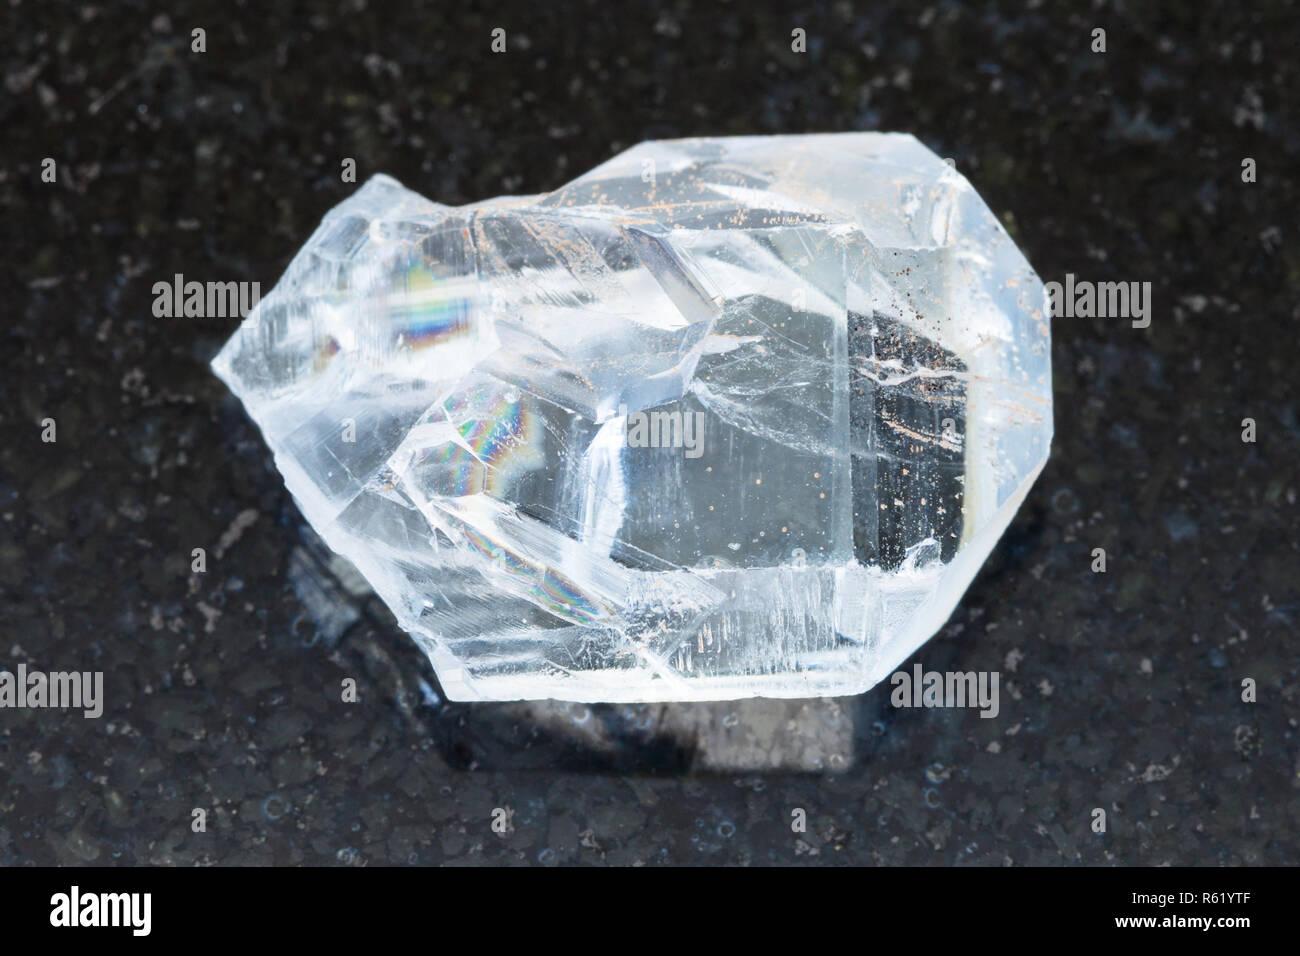 raw crystal of celestine stone on dark background - Stock Image